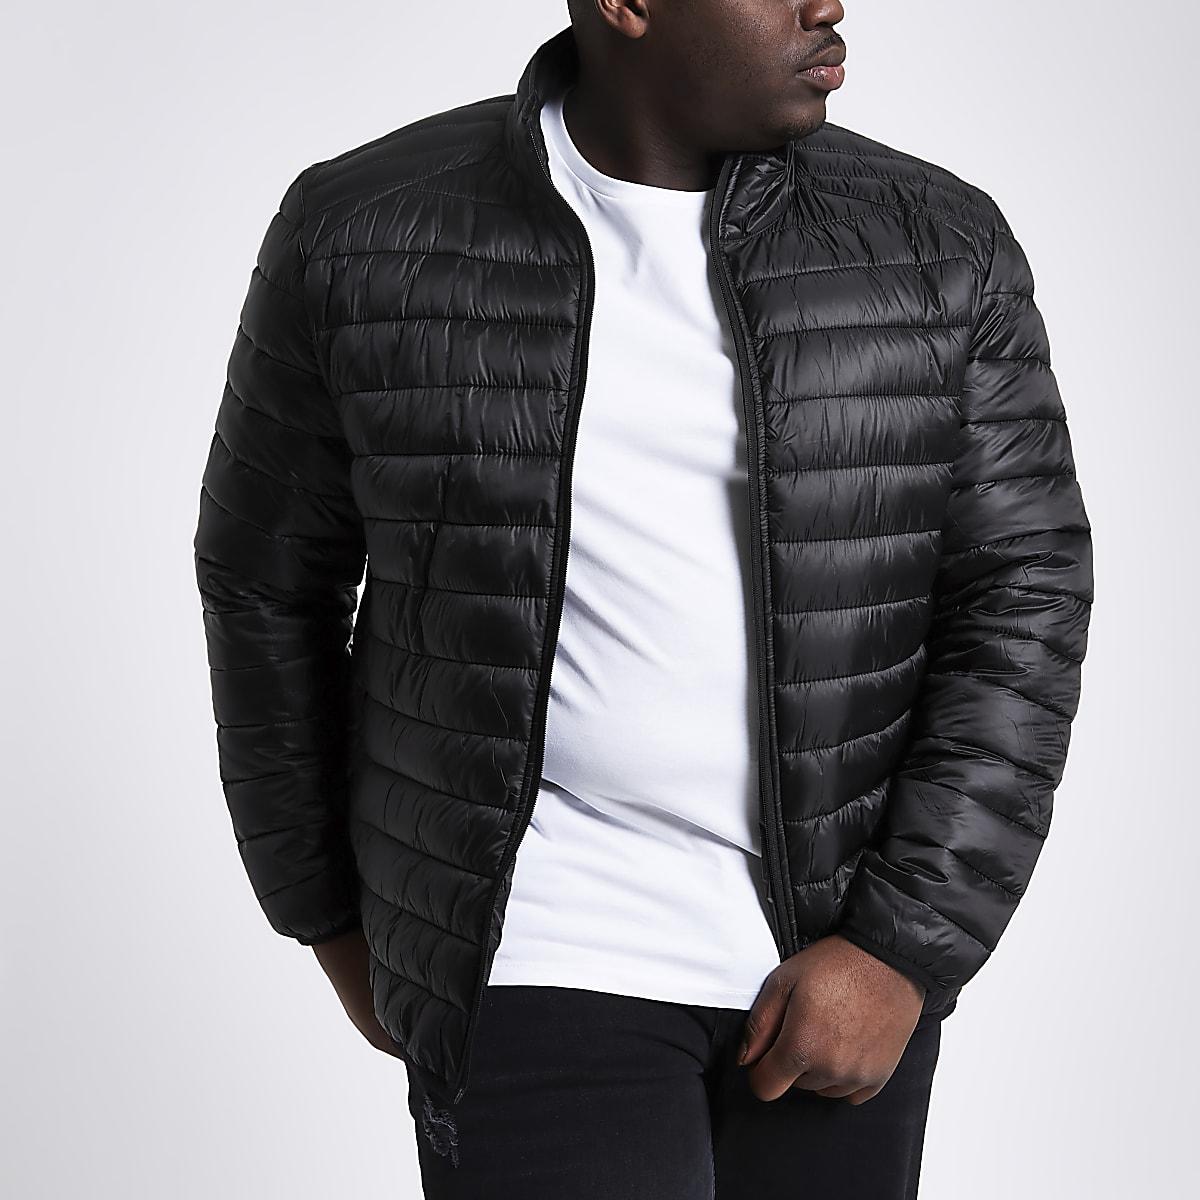 847b7138e Big and Tall black puffer jacket